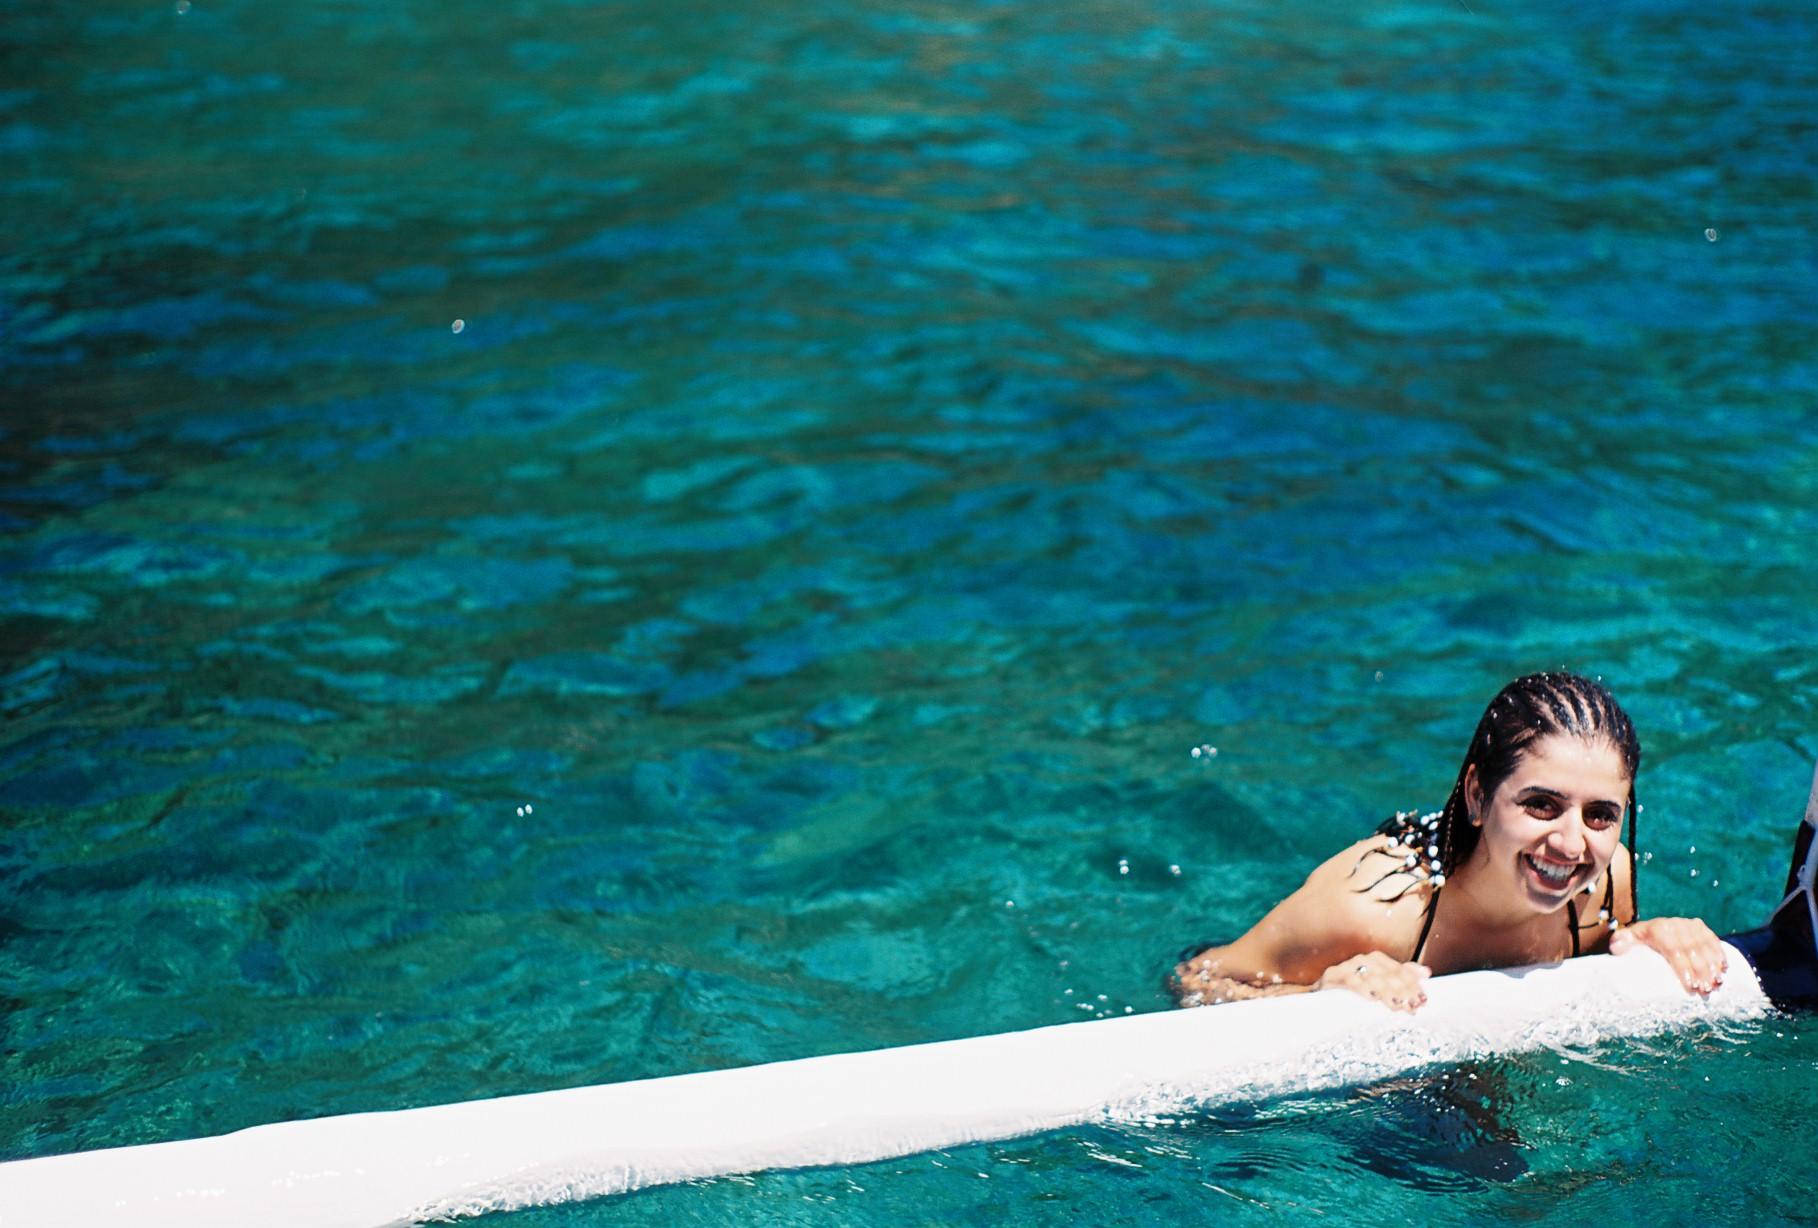 Padangbai Bali Ocean Analogue Travel Photography